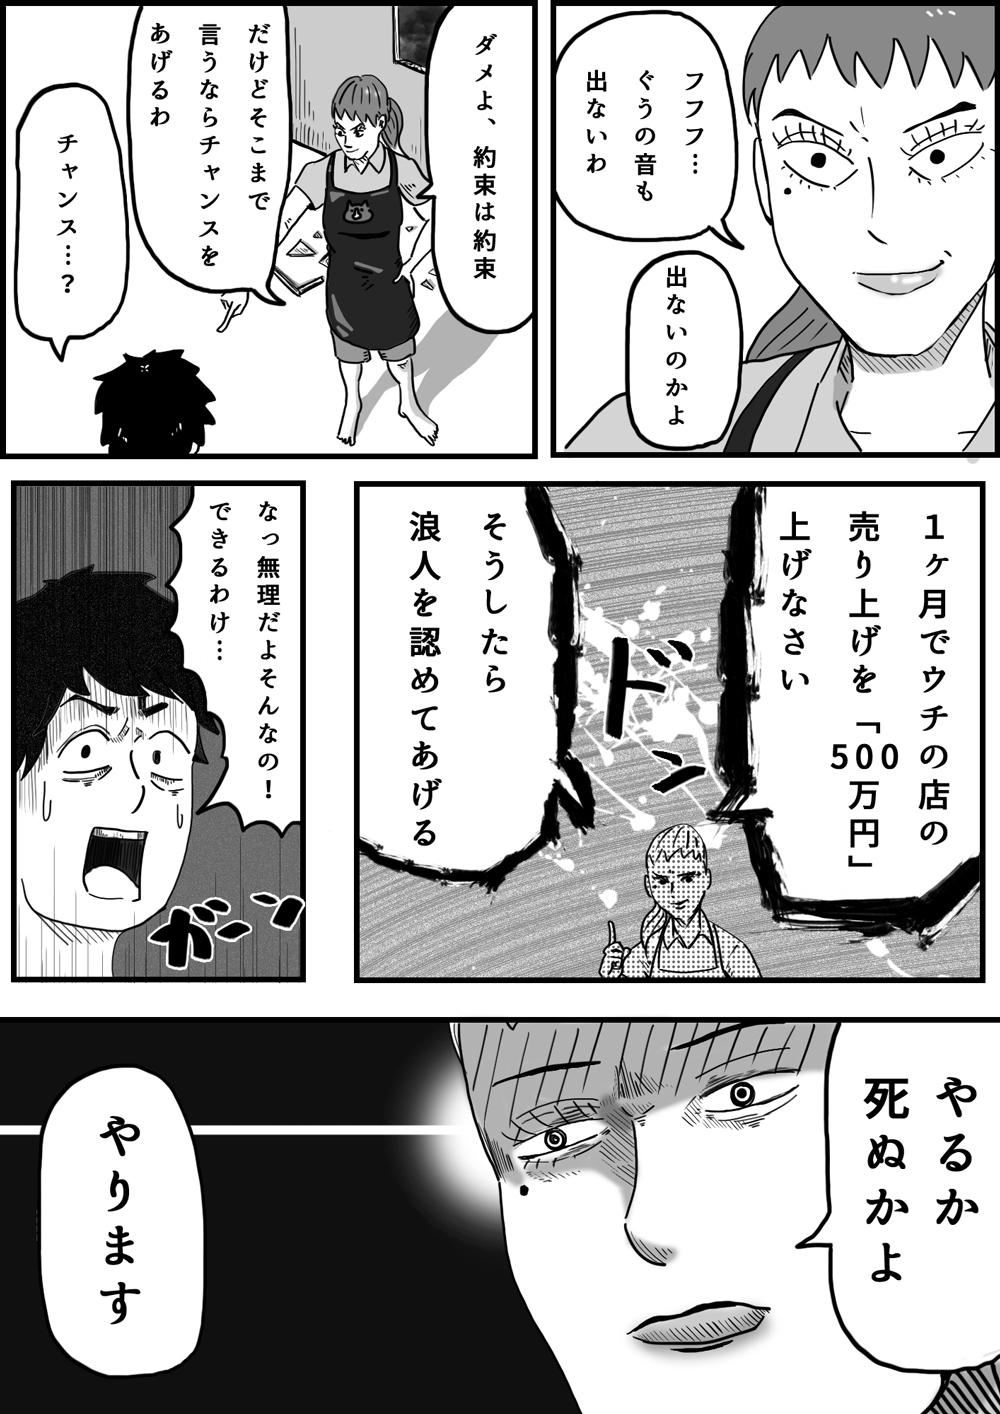 arnolds-hasegawa-004-4